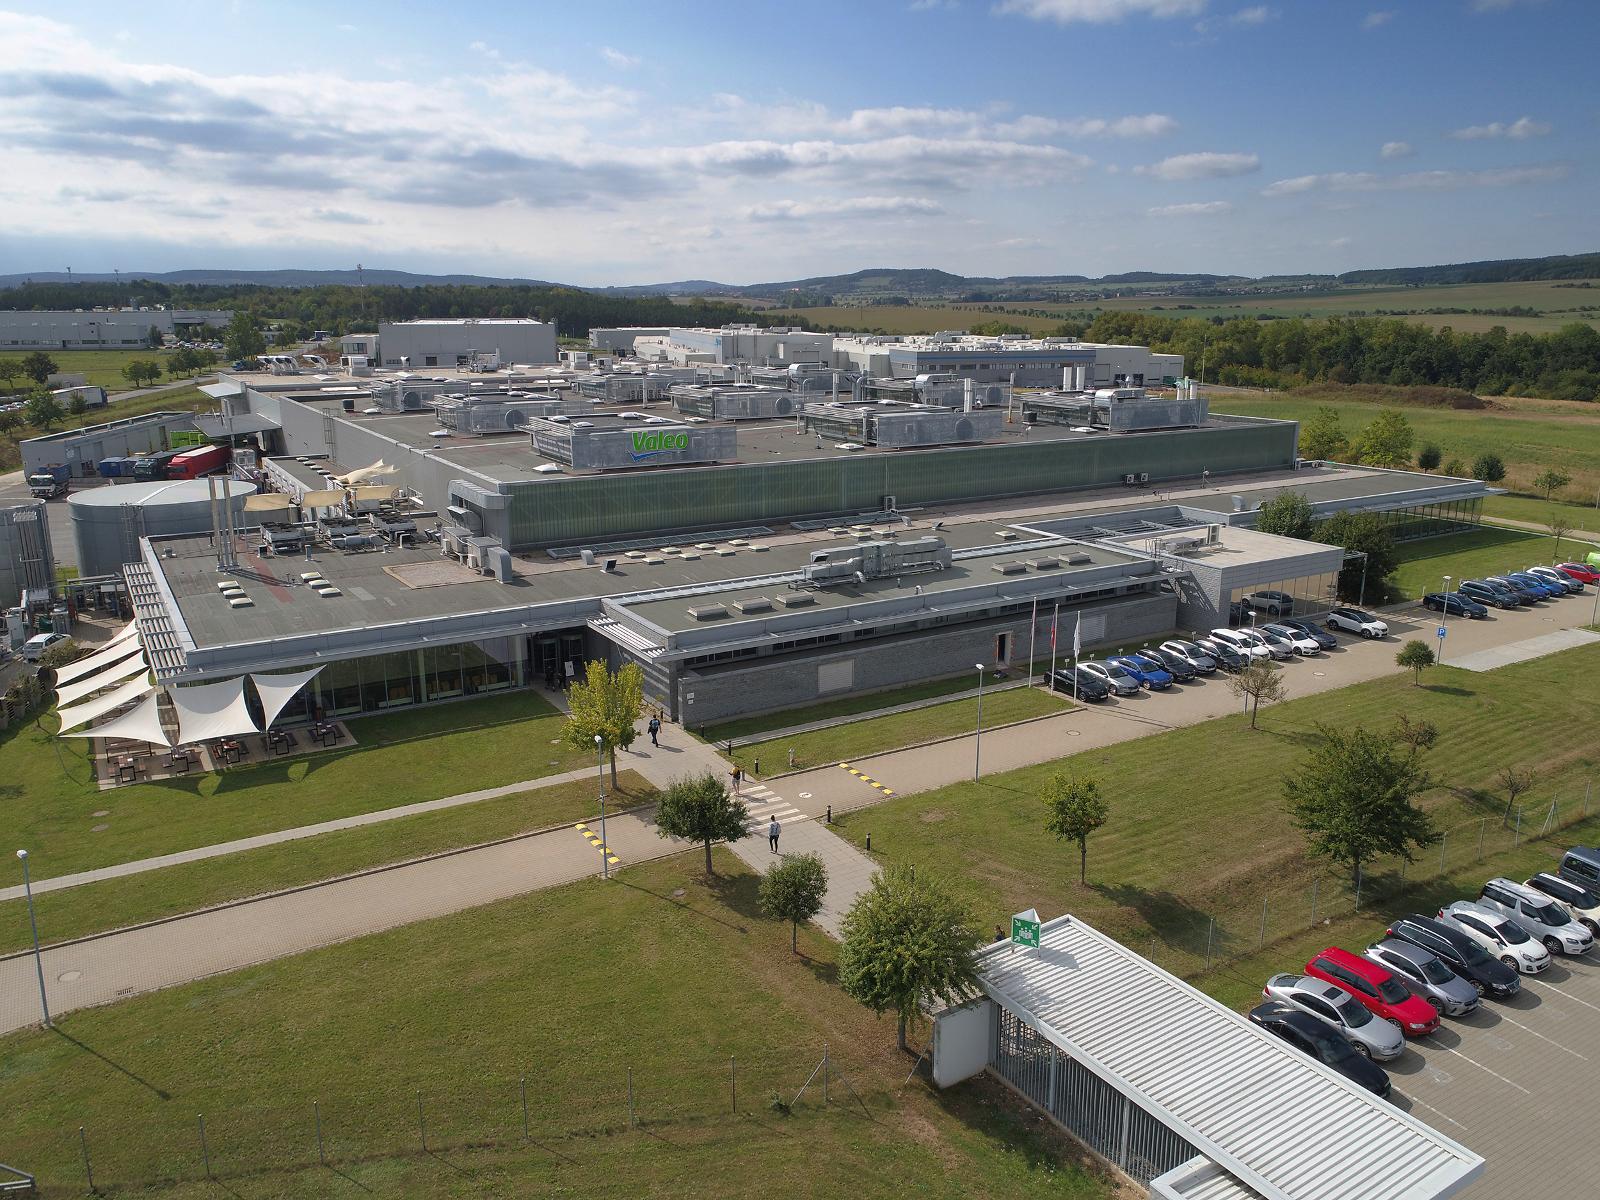 Aerial view of Valeo Zebrak plant